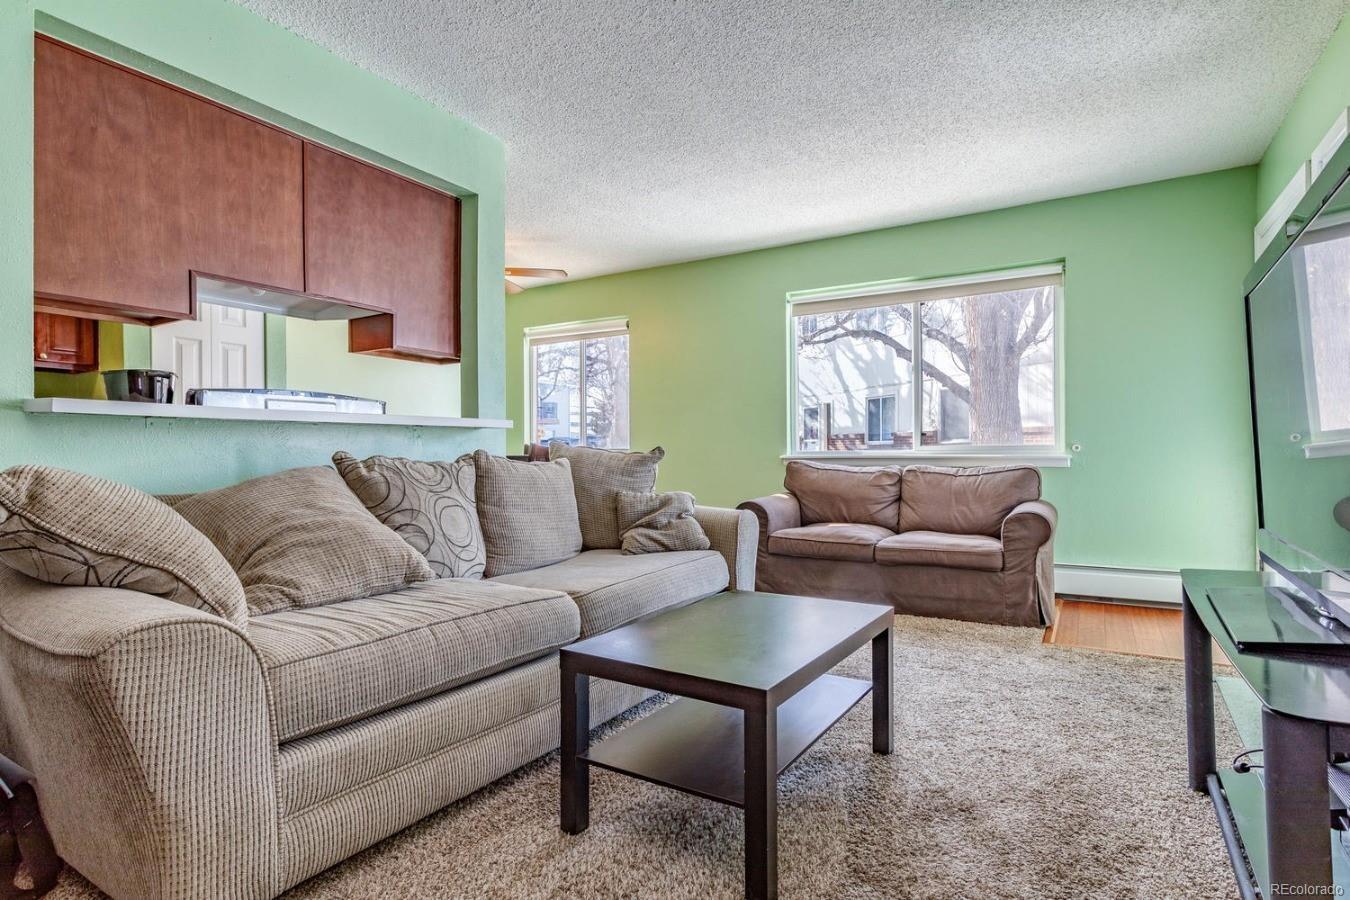 MLS# 8240620 - 6 - 7309 W Hampden Avenue #6203, Lakewood, CO 80227